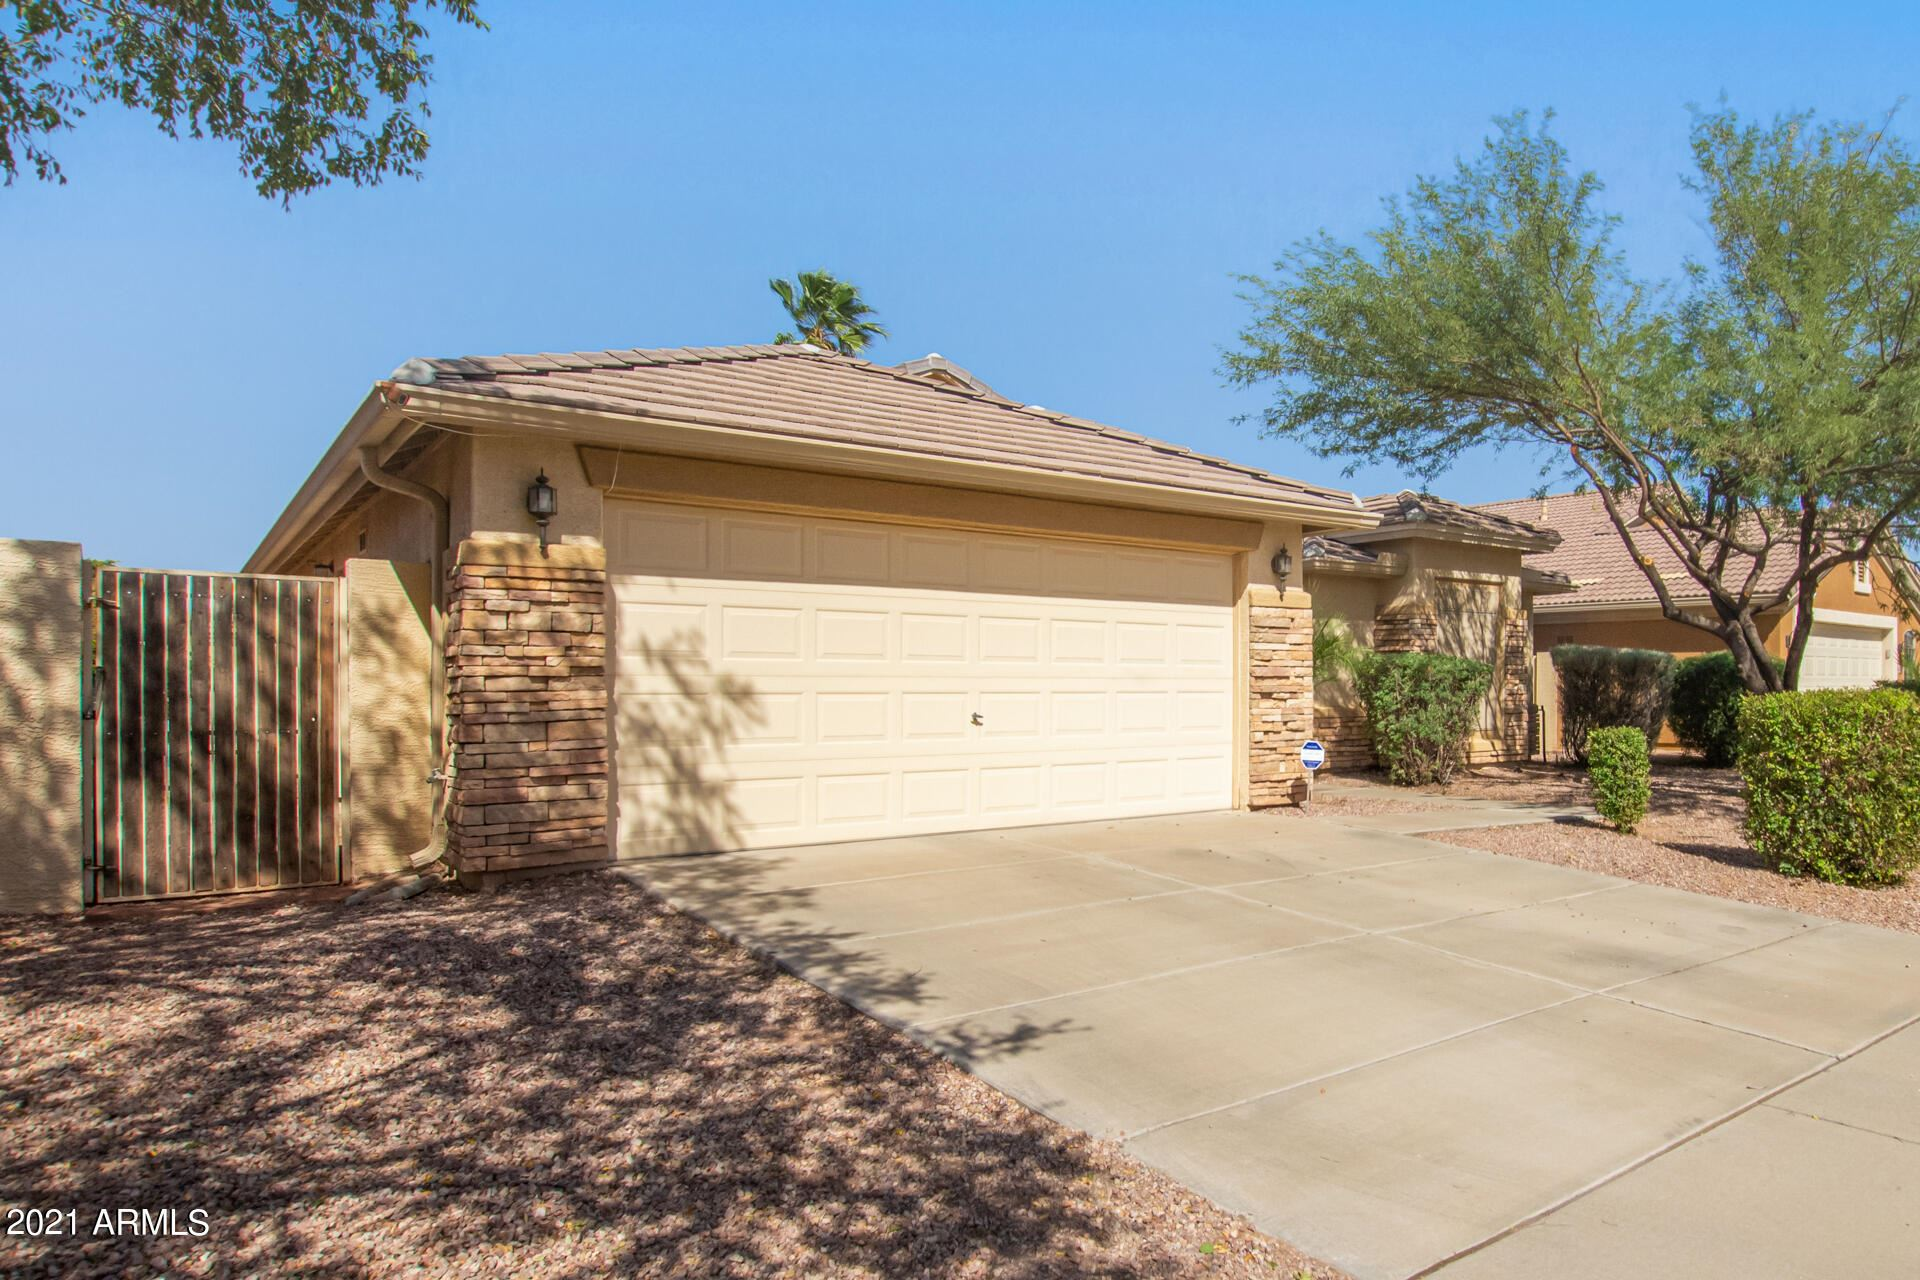 Photo of 8634 W APACHE Street, Tolleson, AZ 85353 (MLS # 6307278)